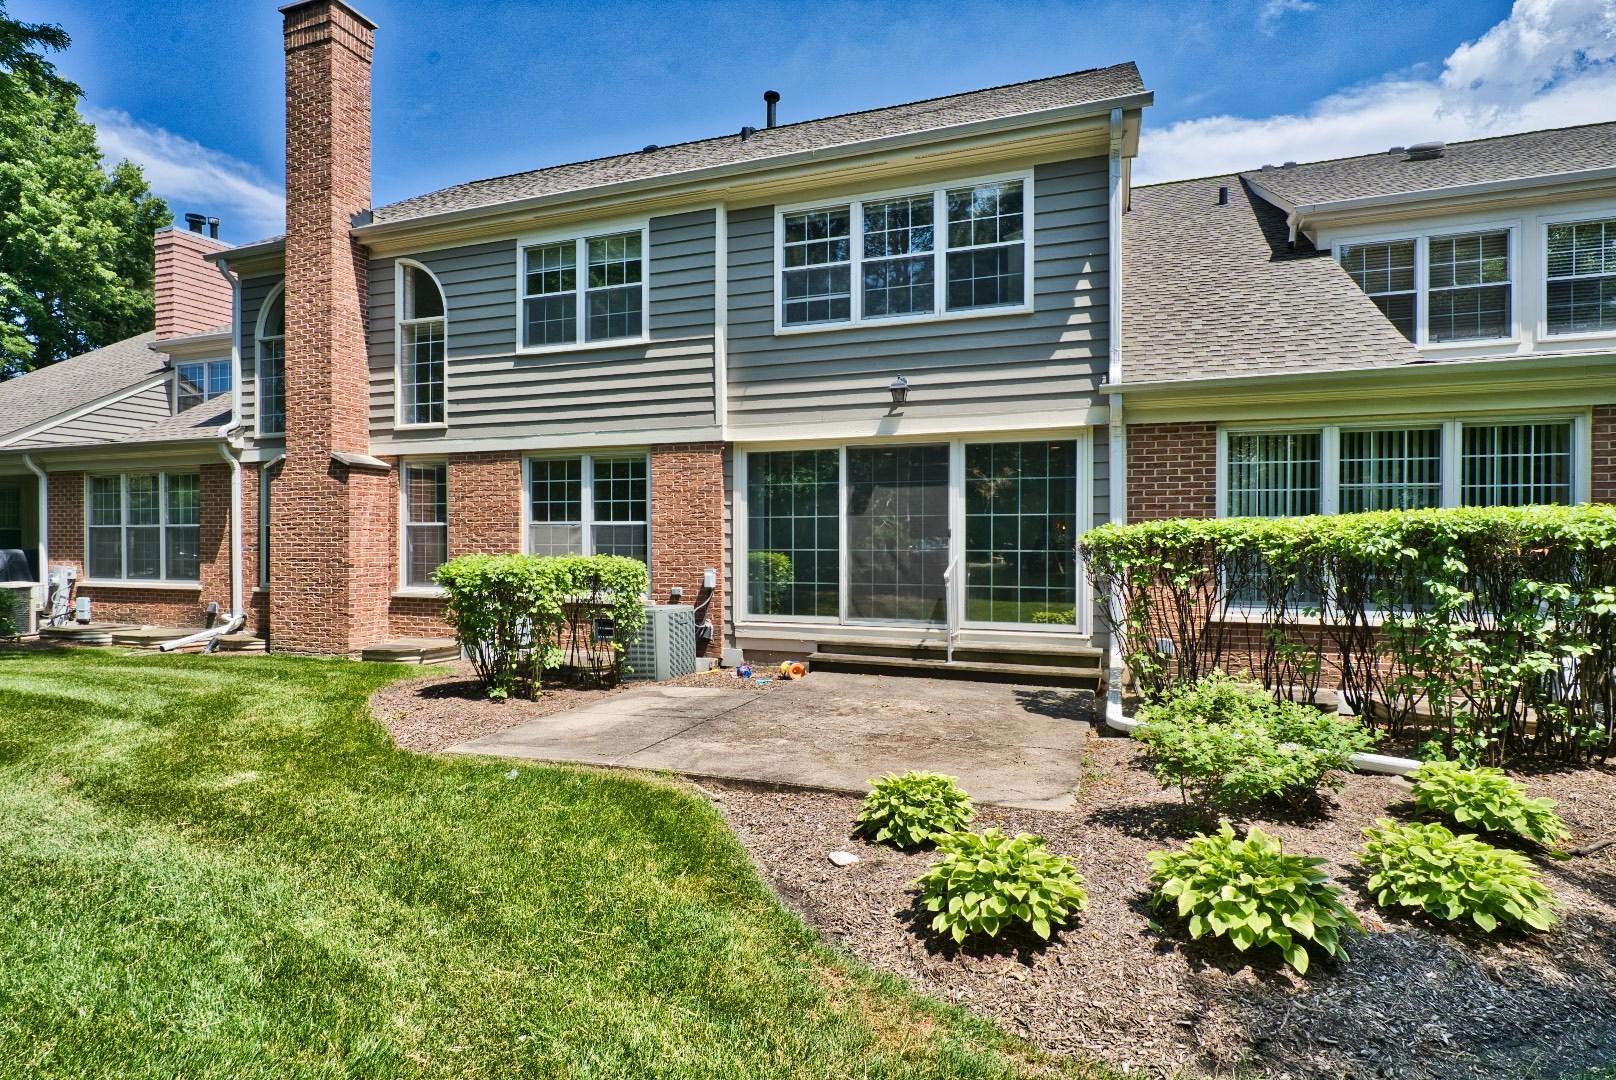 122 Cornell, Glenview, Illinois, 60026